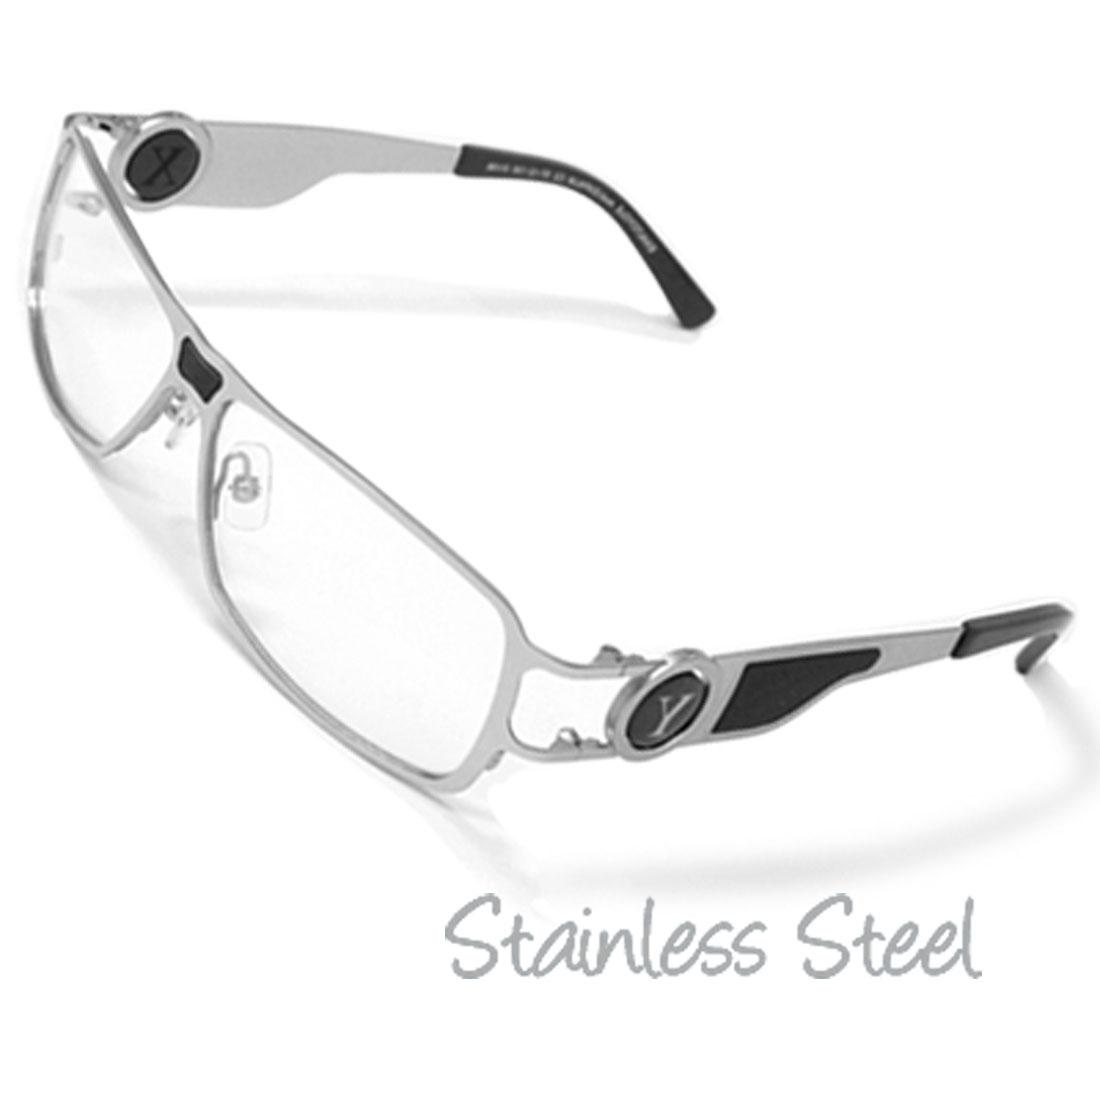 Silvery Unisex Stainless Steel Optical Eyeglasses Frame